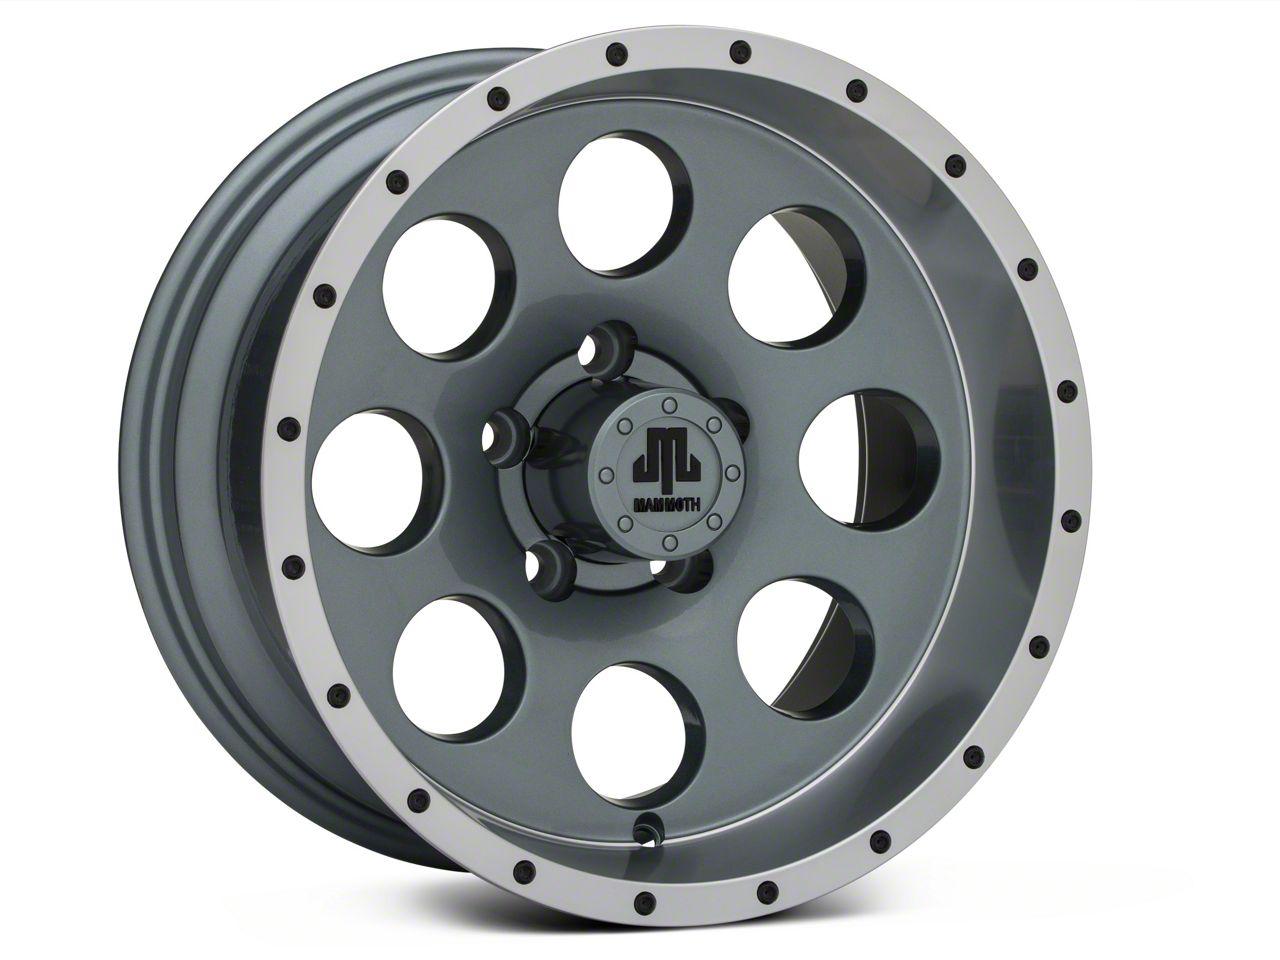 Mammoth 8 Beadlock Style Anthracite 15x8 Wheel & Mickey Thompson Baja MTZP3 31x10.50R15 Tire Kit (87-06 Jeep Wrangler YJ & TJ)